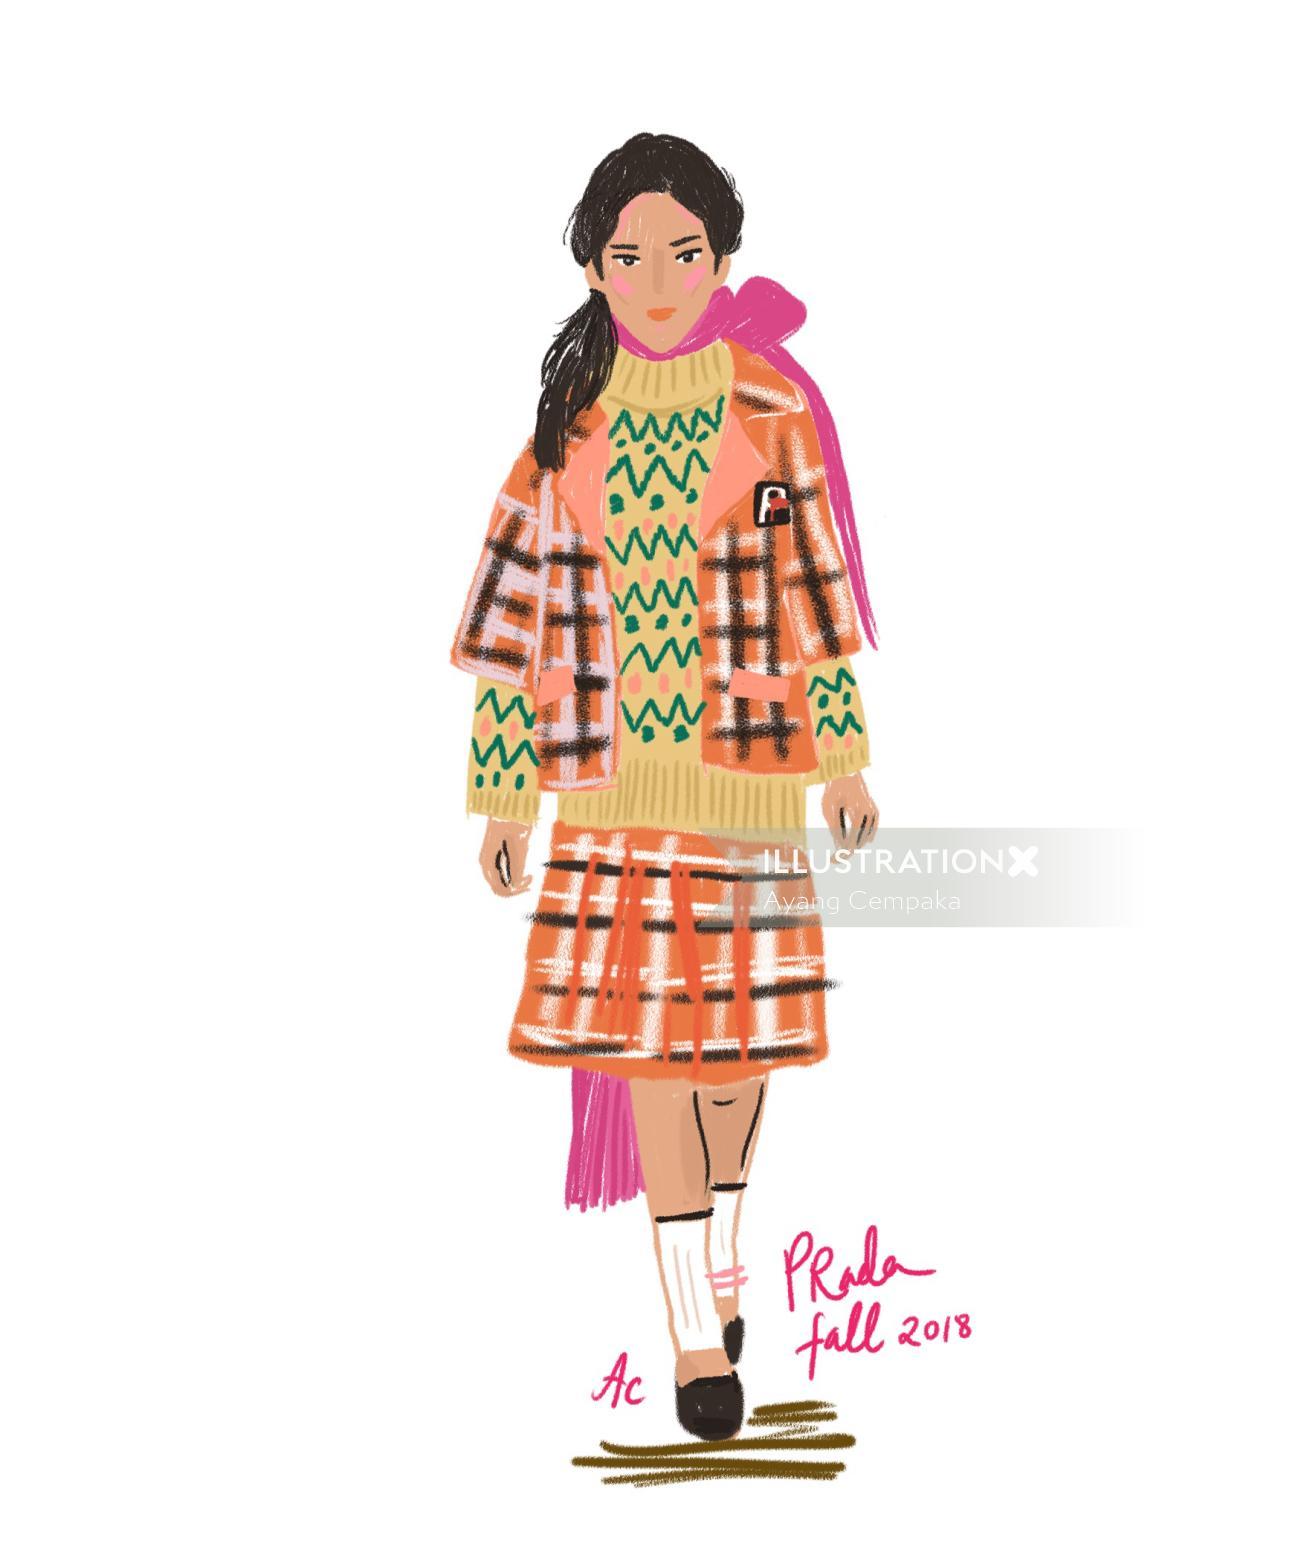 Fashion illustration Prada fall 2018